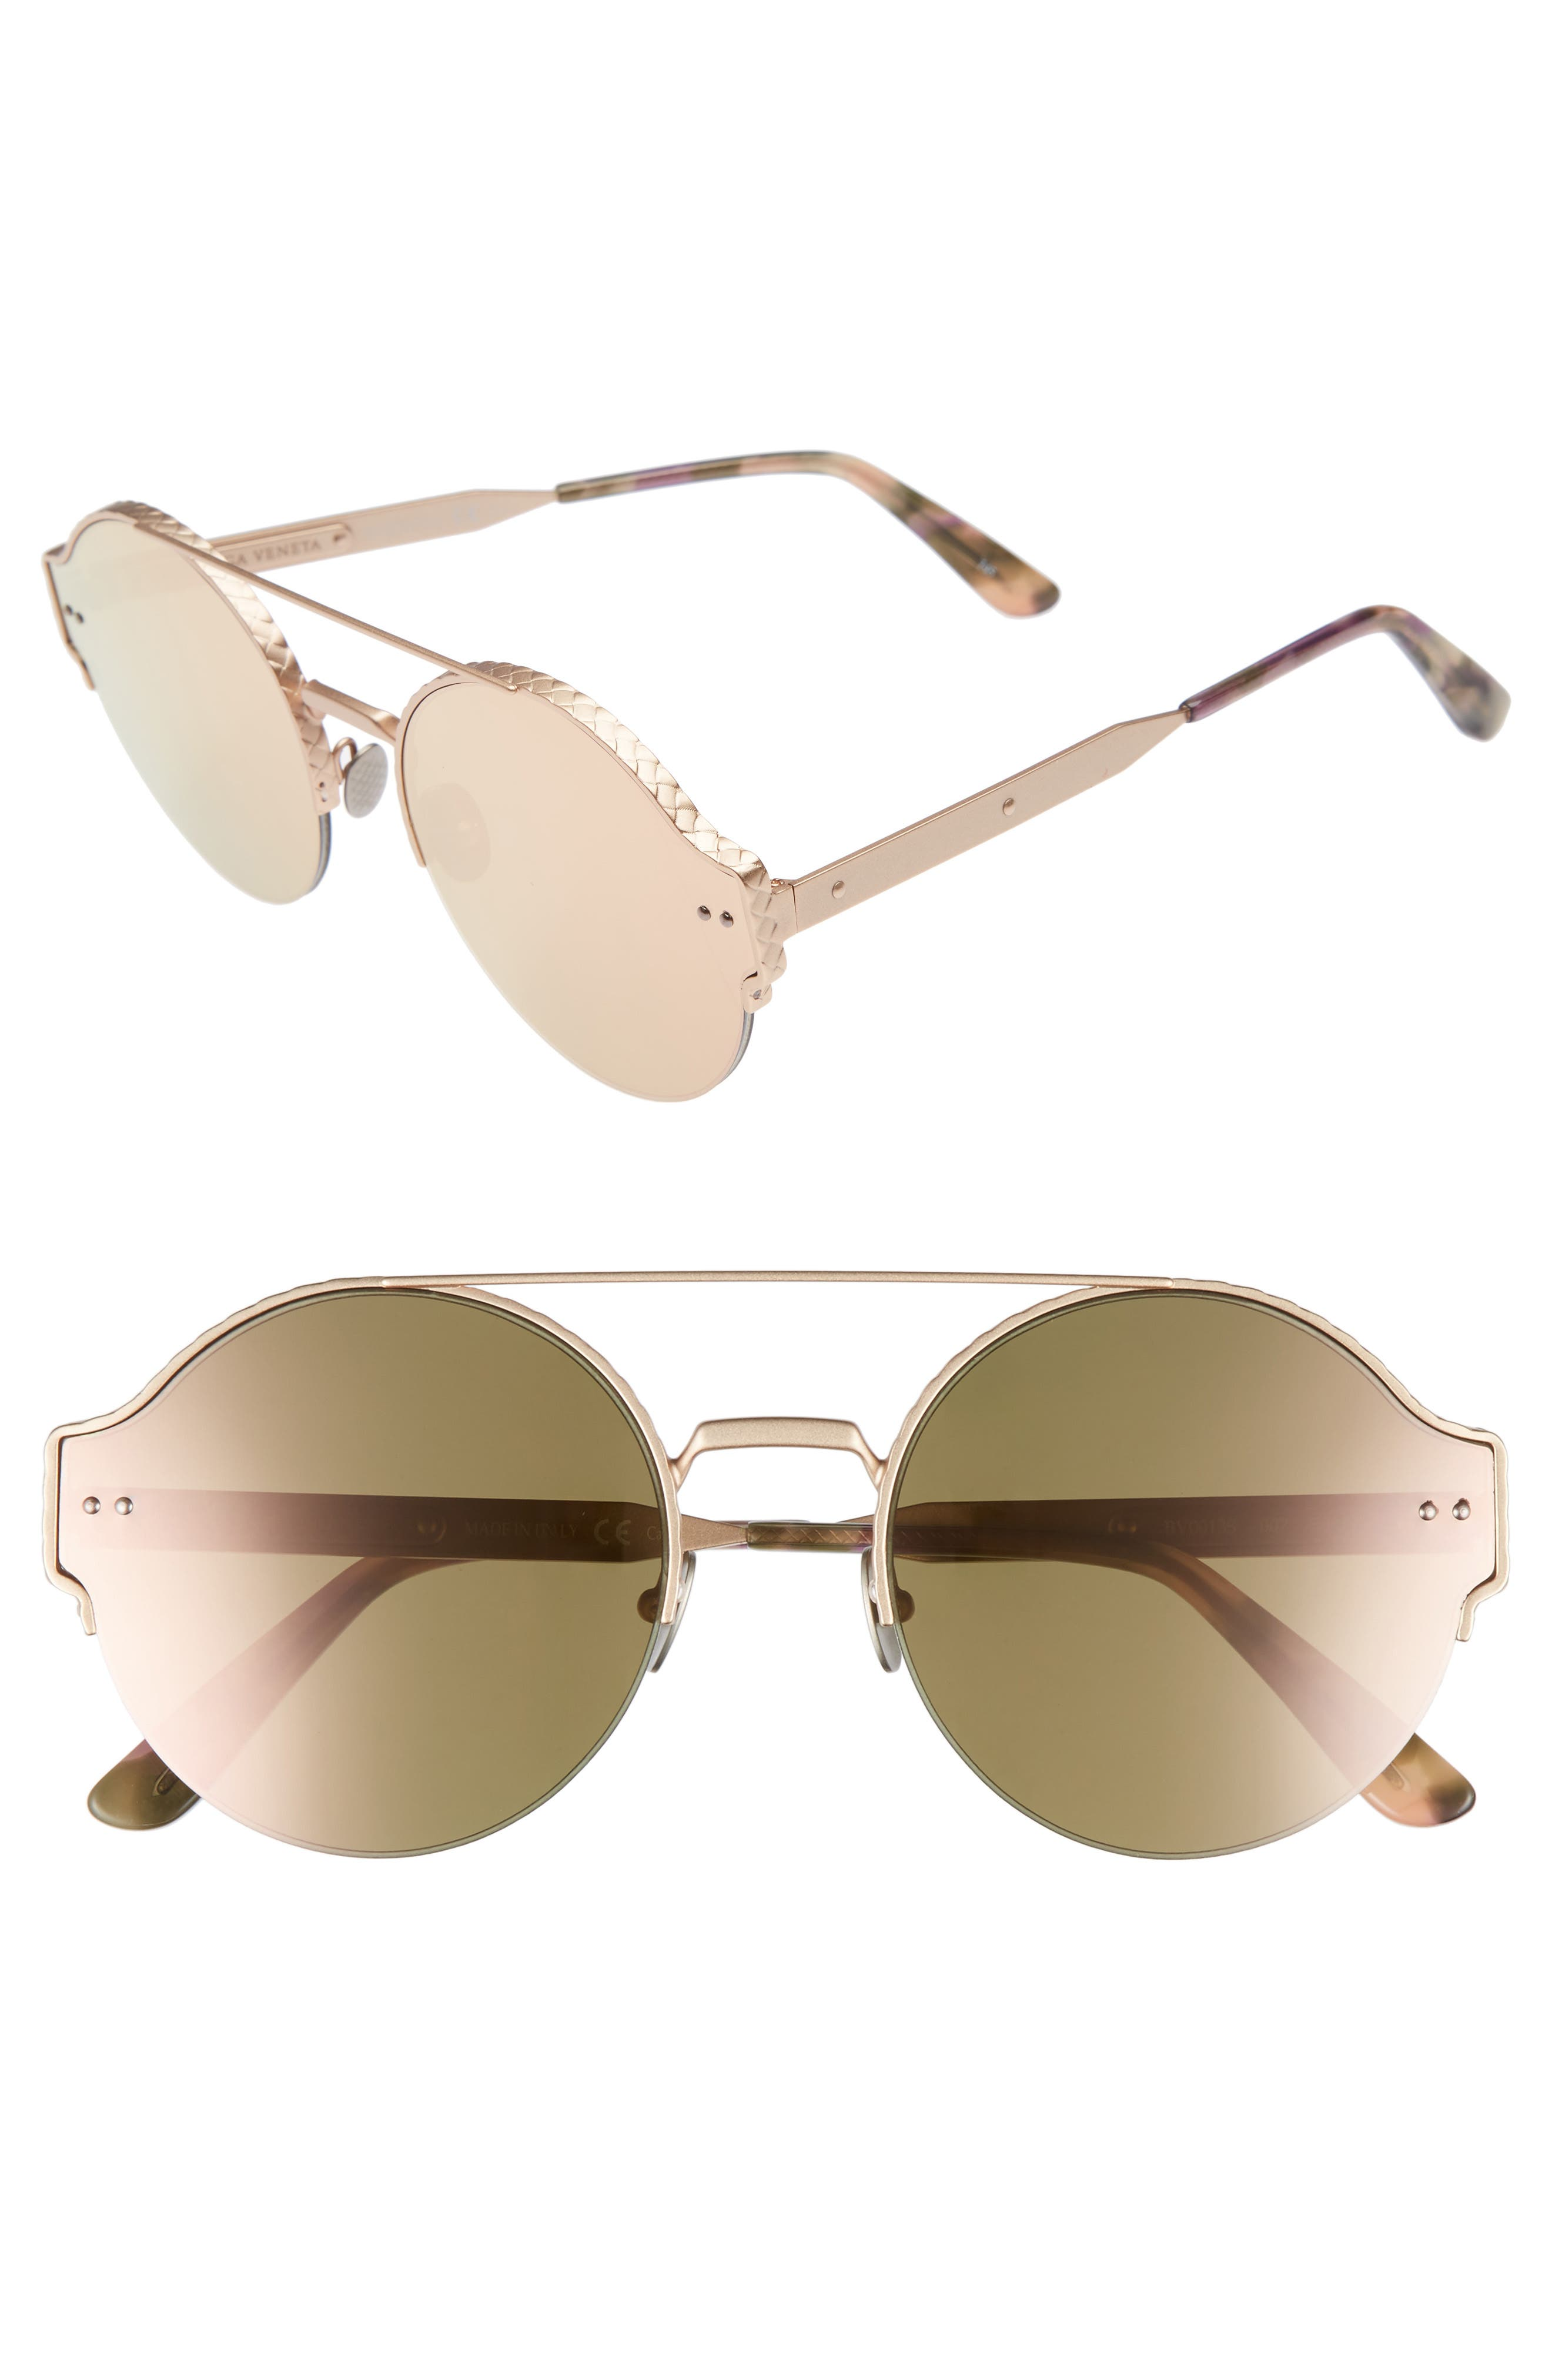 54mm Round Semi-Rimless Sunglasses,                             Main thumbnail 3, color,